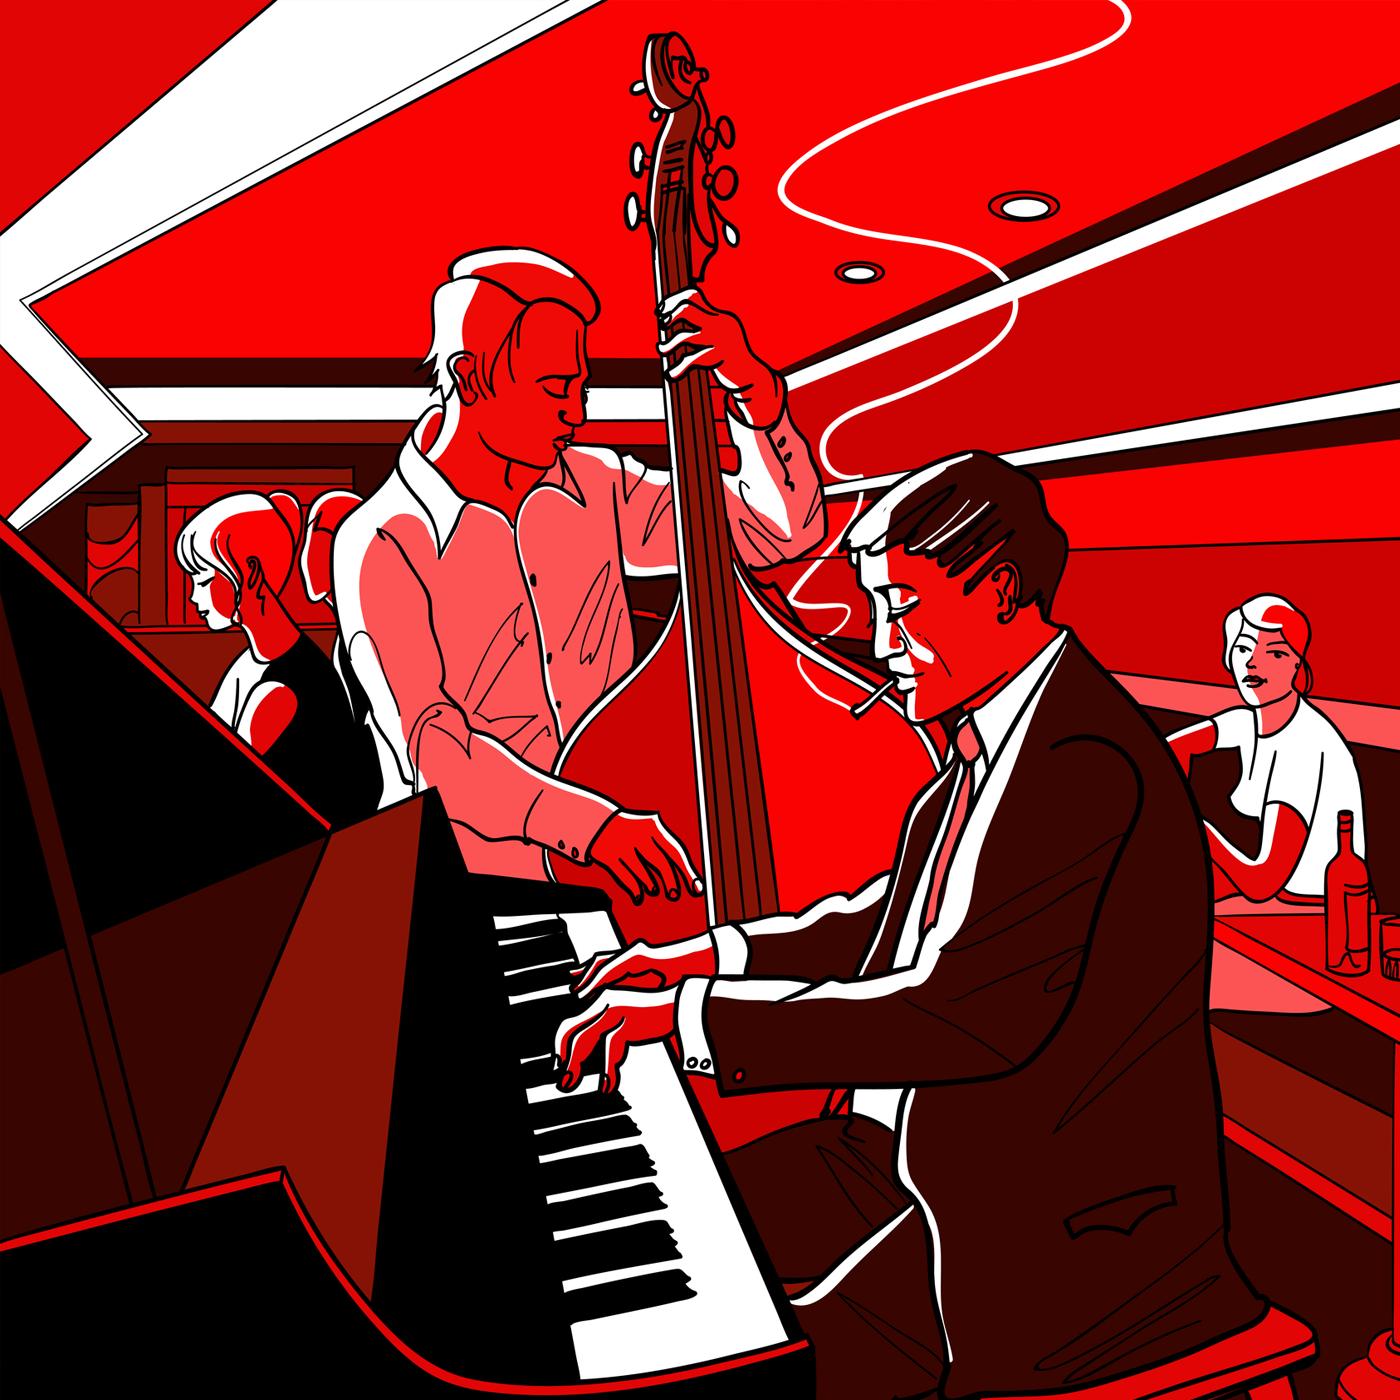 Piano Trios On Jazzradio Com Jazzradio Com Enjoy Great